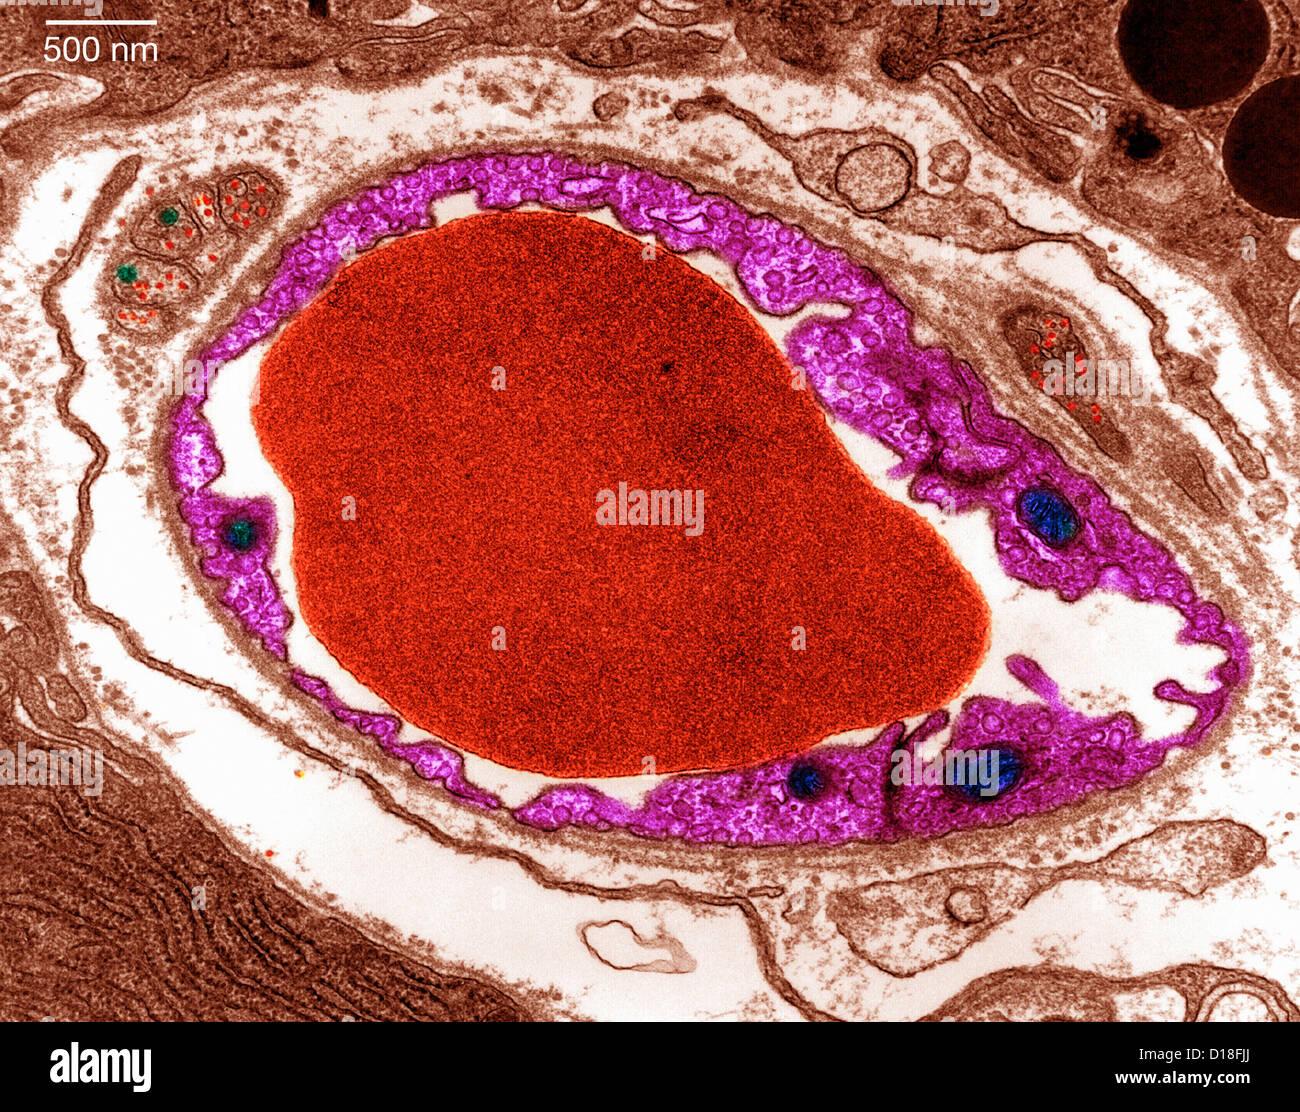 Transmission Electron micrograph pancreas - Stock Image